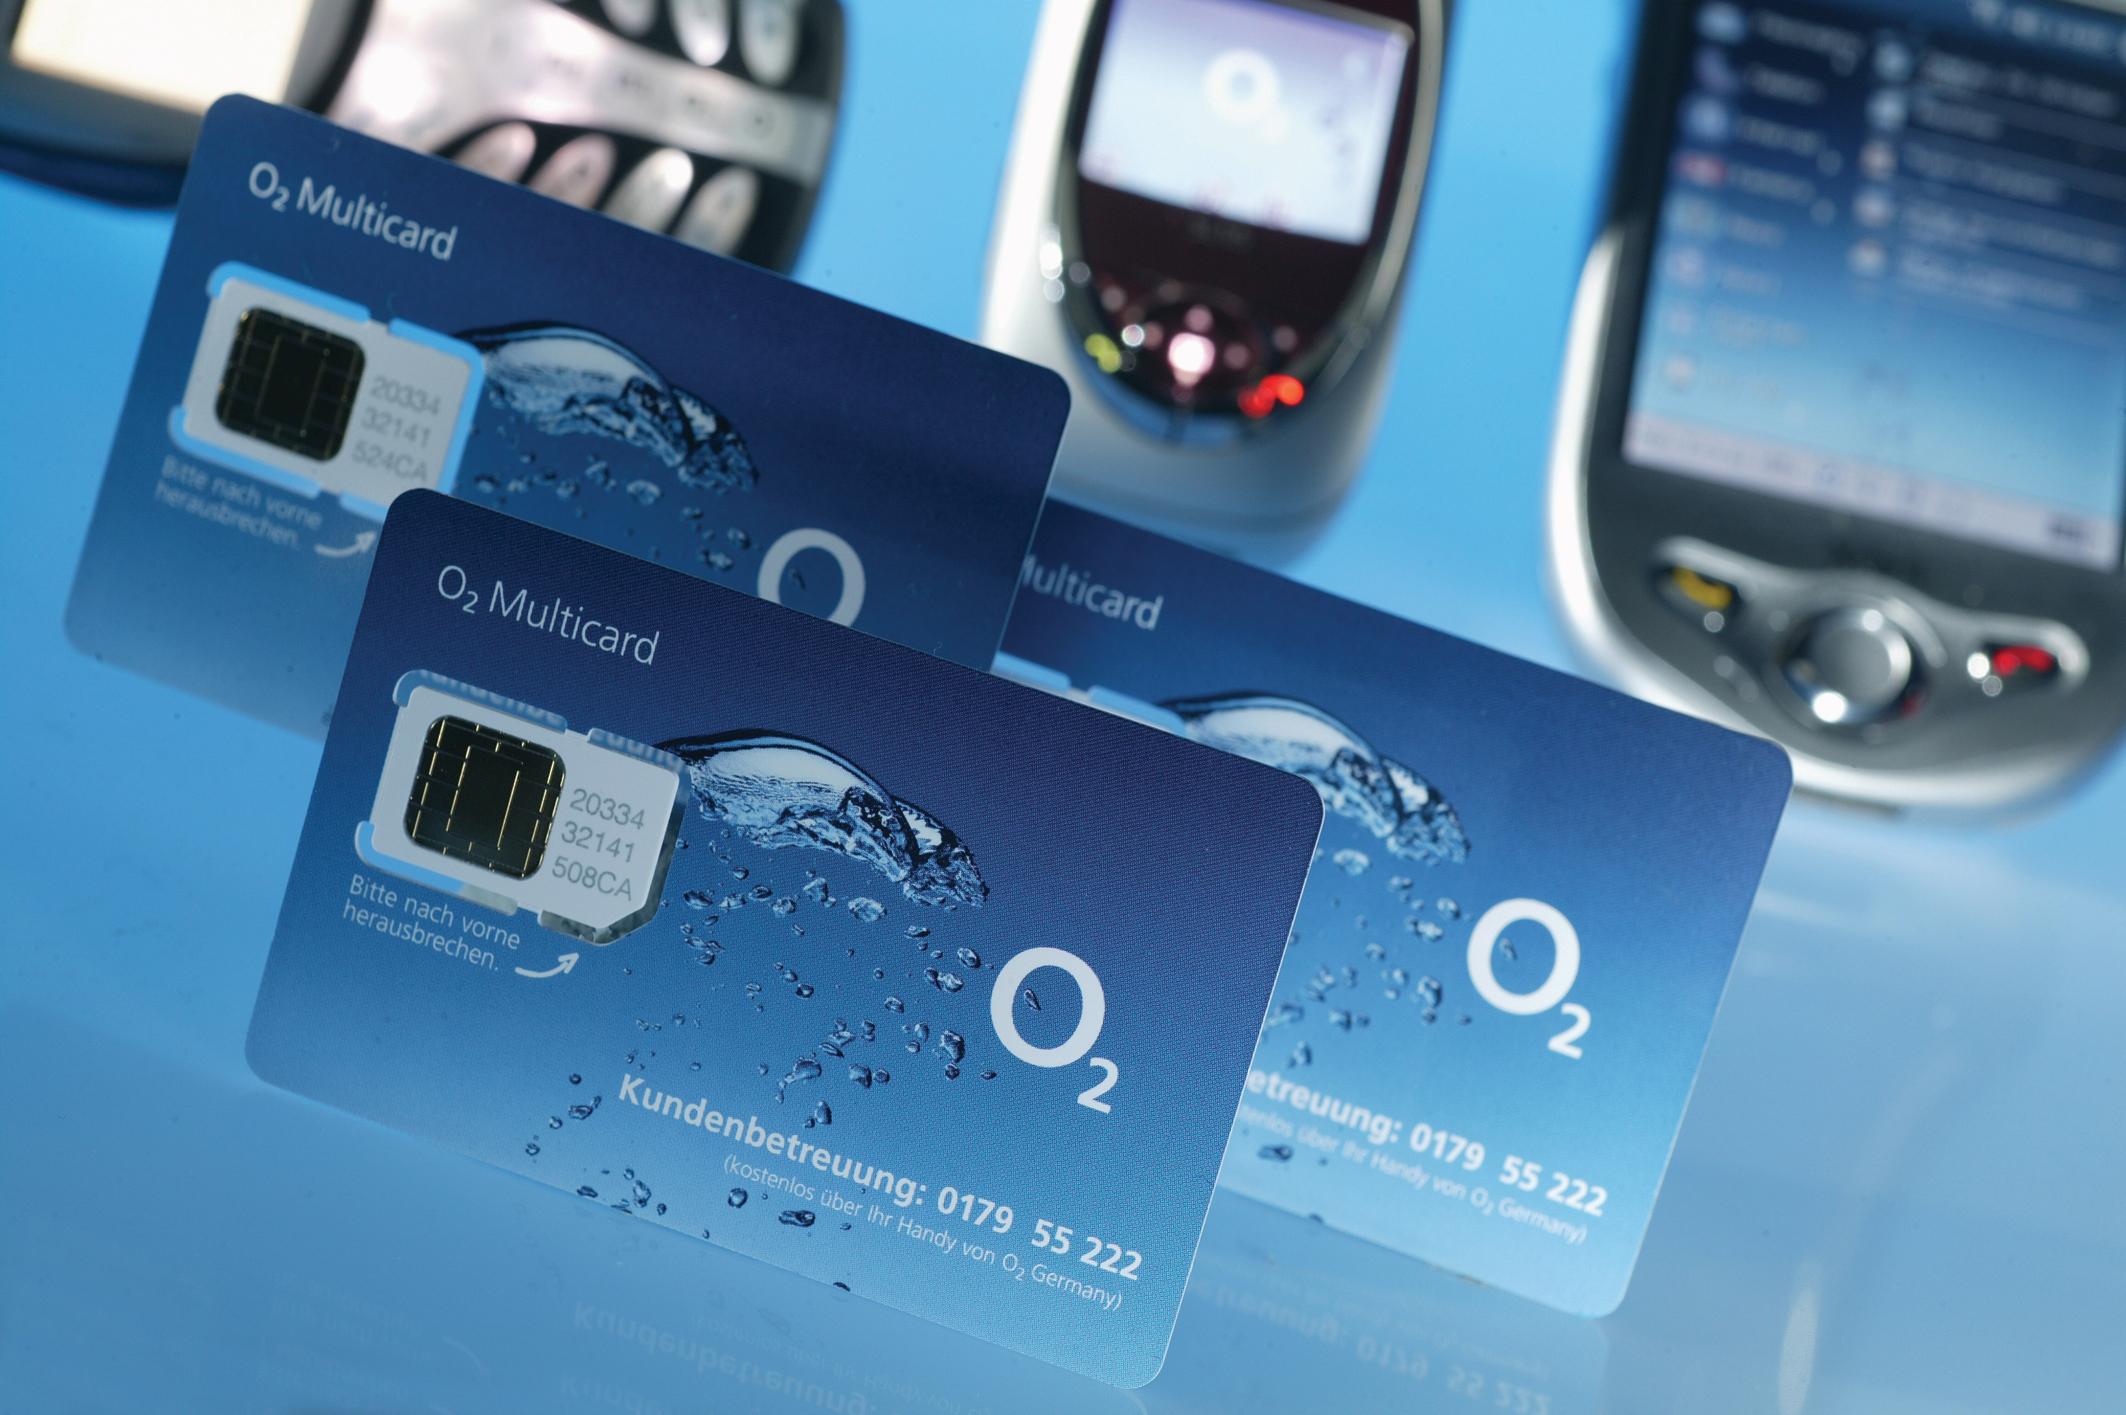 Probleme mit VoLITE und WiFi Calling bei o2 (Foto: Telefónica)